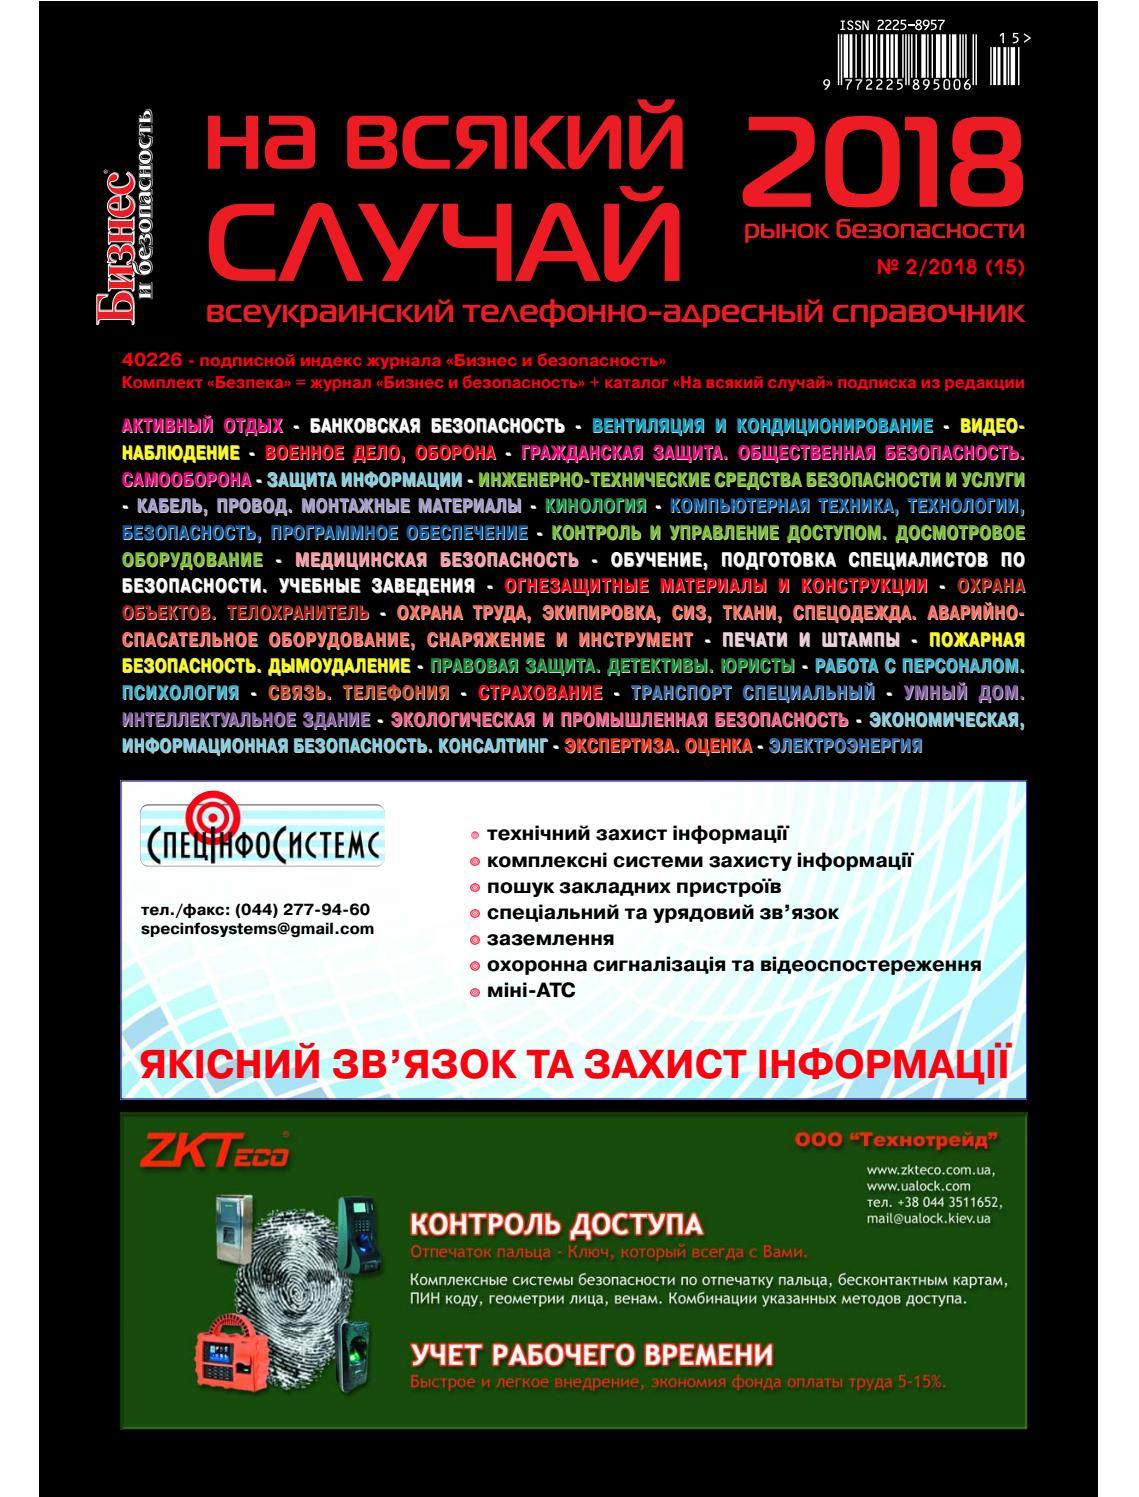 37aa26059b75 На всякий случай 2/2018 (15) - Ukrainian Security Yellow Pages by smpg  shans ltd. - issuu